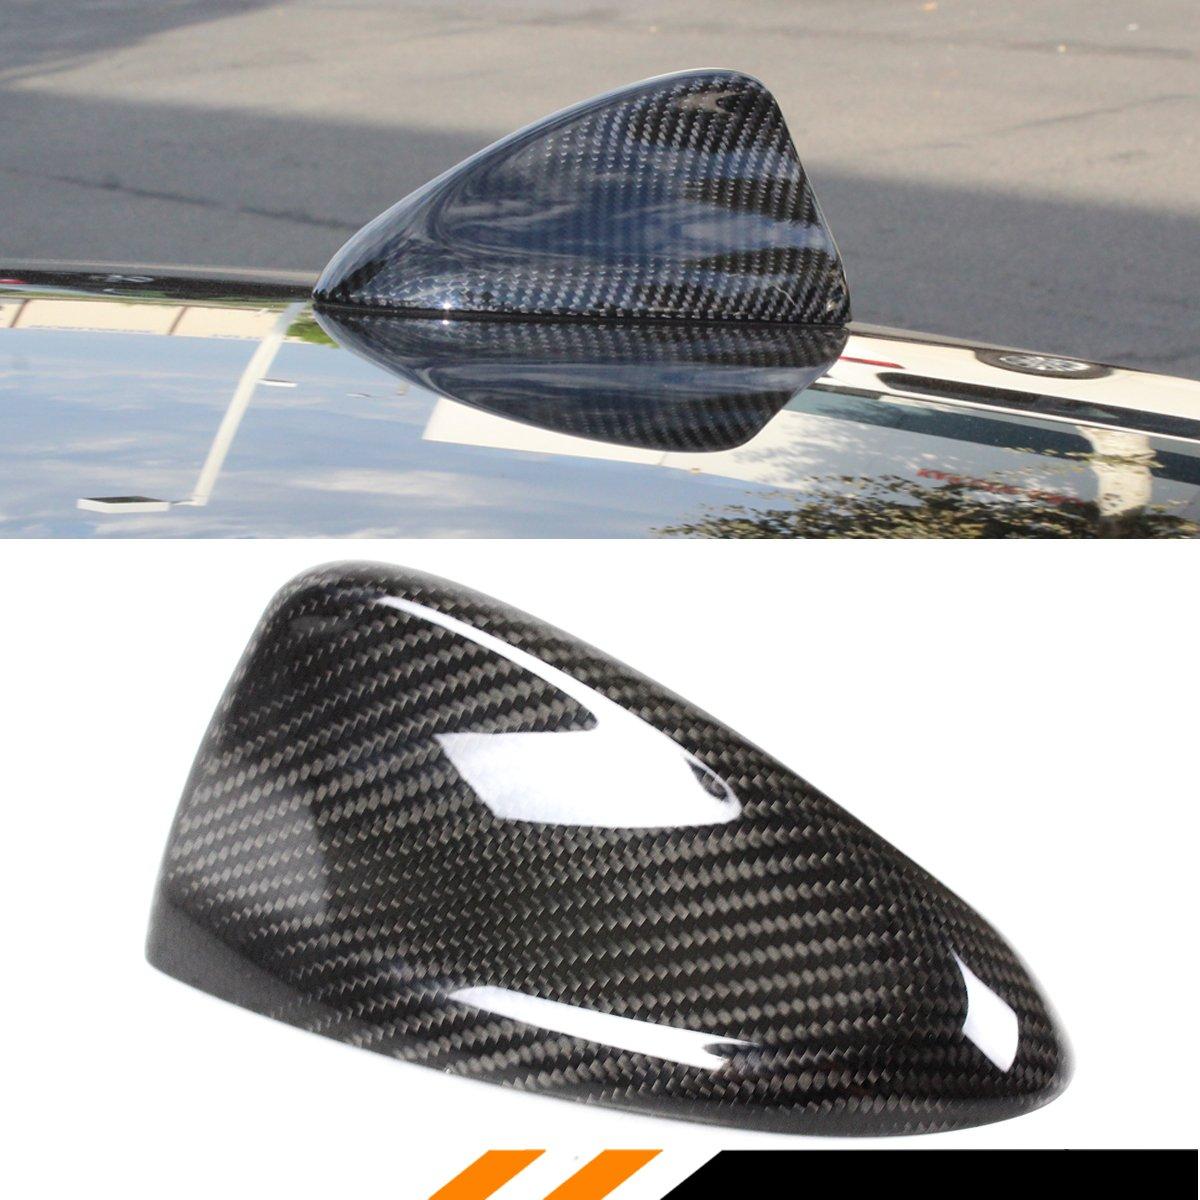 Cuztom Tuning for 2017 2018 ALFA Romeo Giulia QUADRIFOGLIO Carbon Fiber Shark FIN Antenna Cover Cap